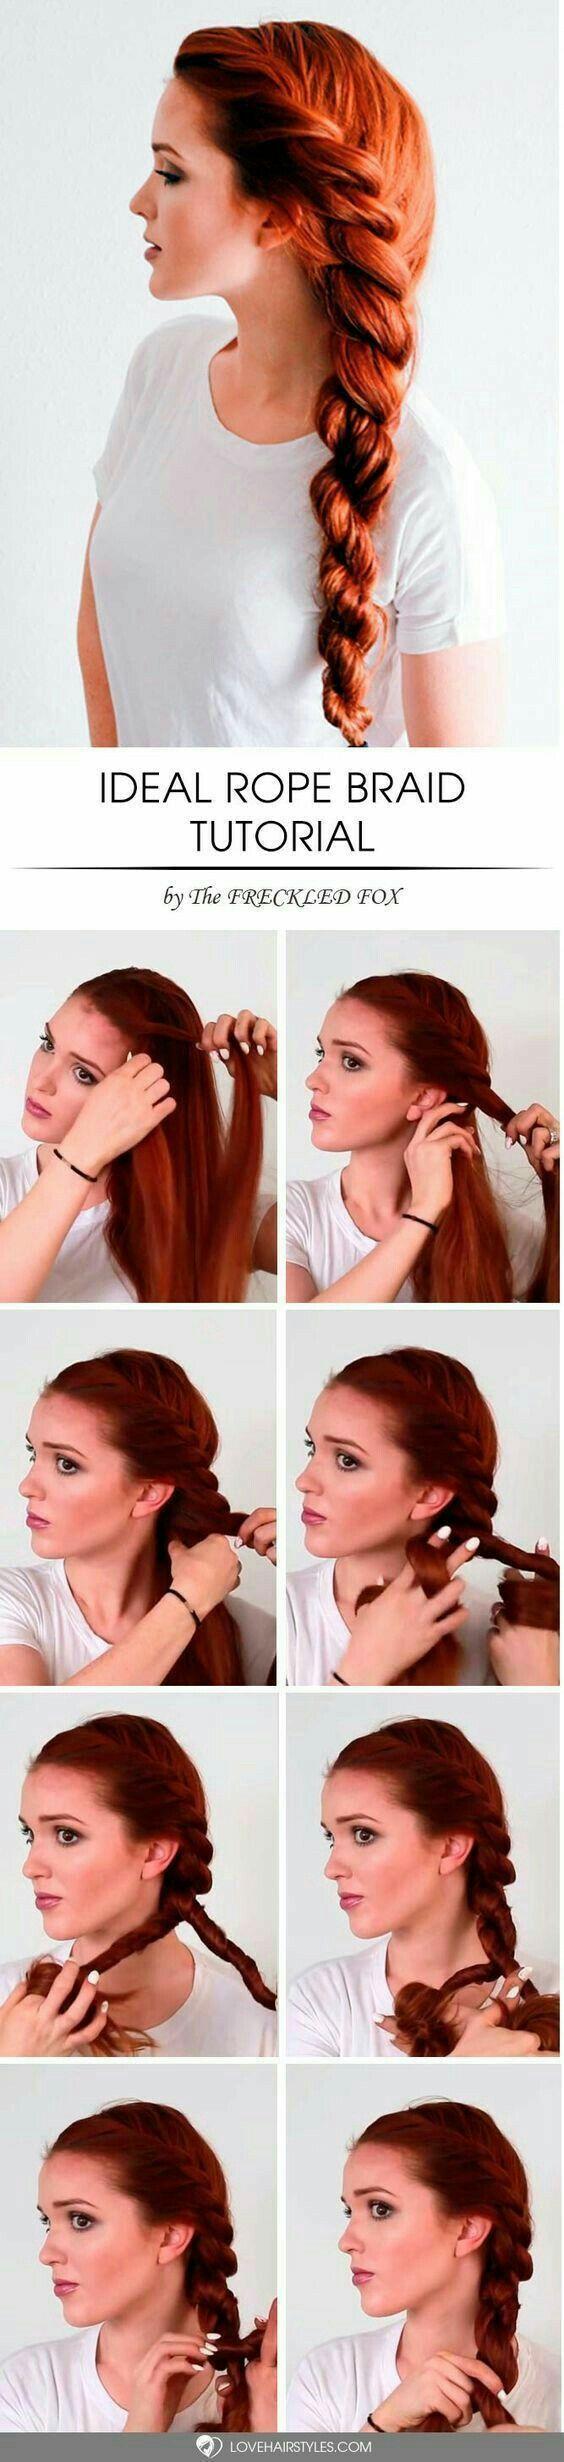 Pin by sara samson on my style pinterest side pony hair style